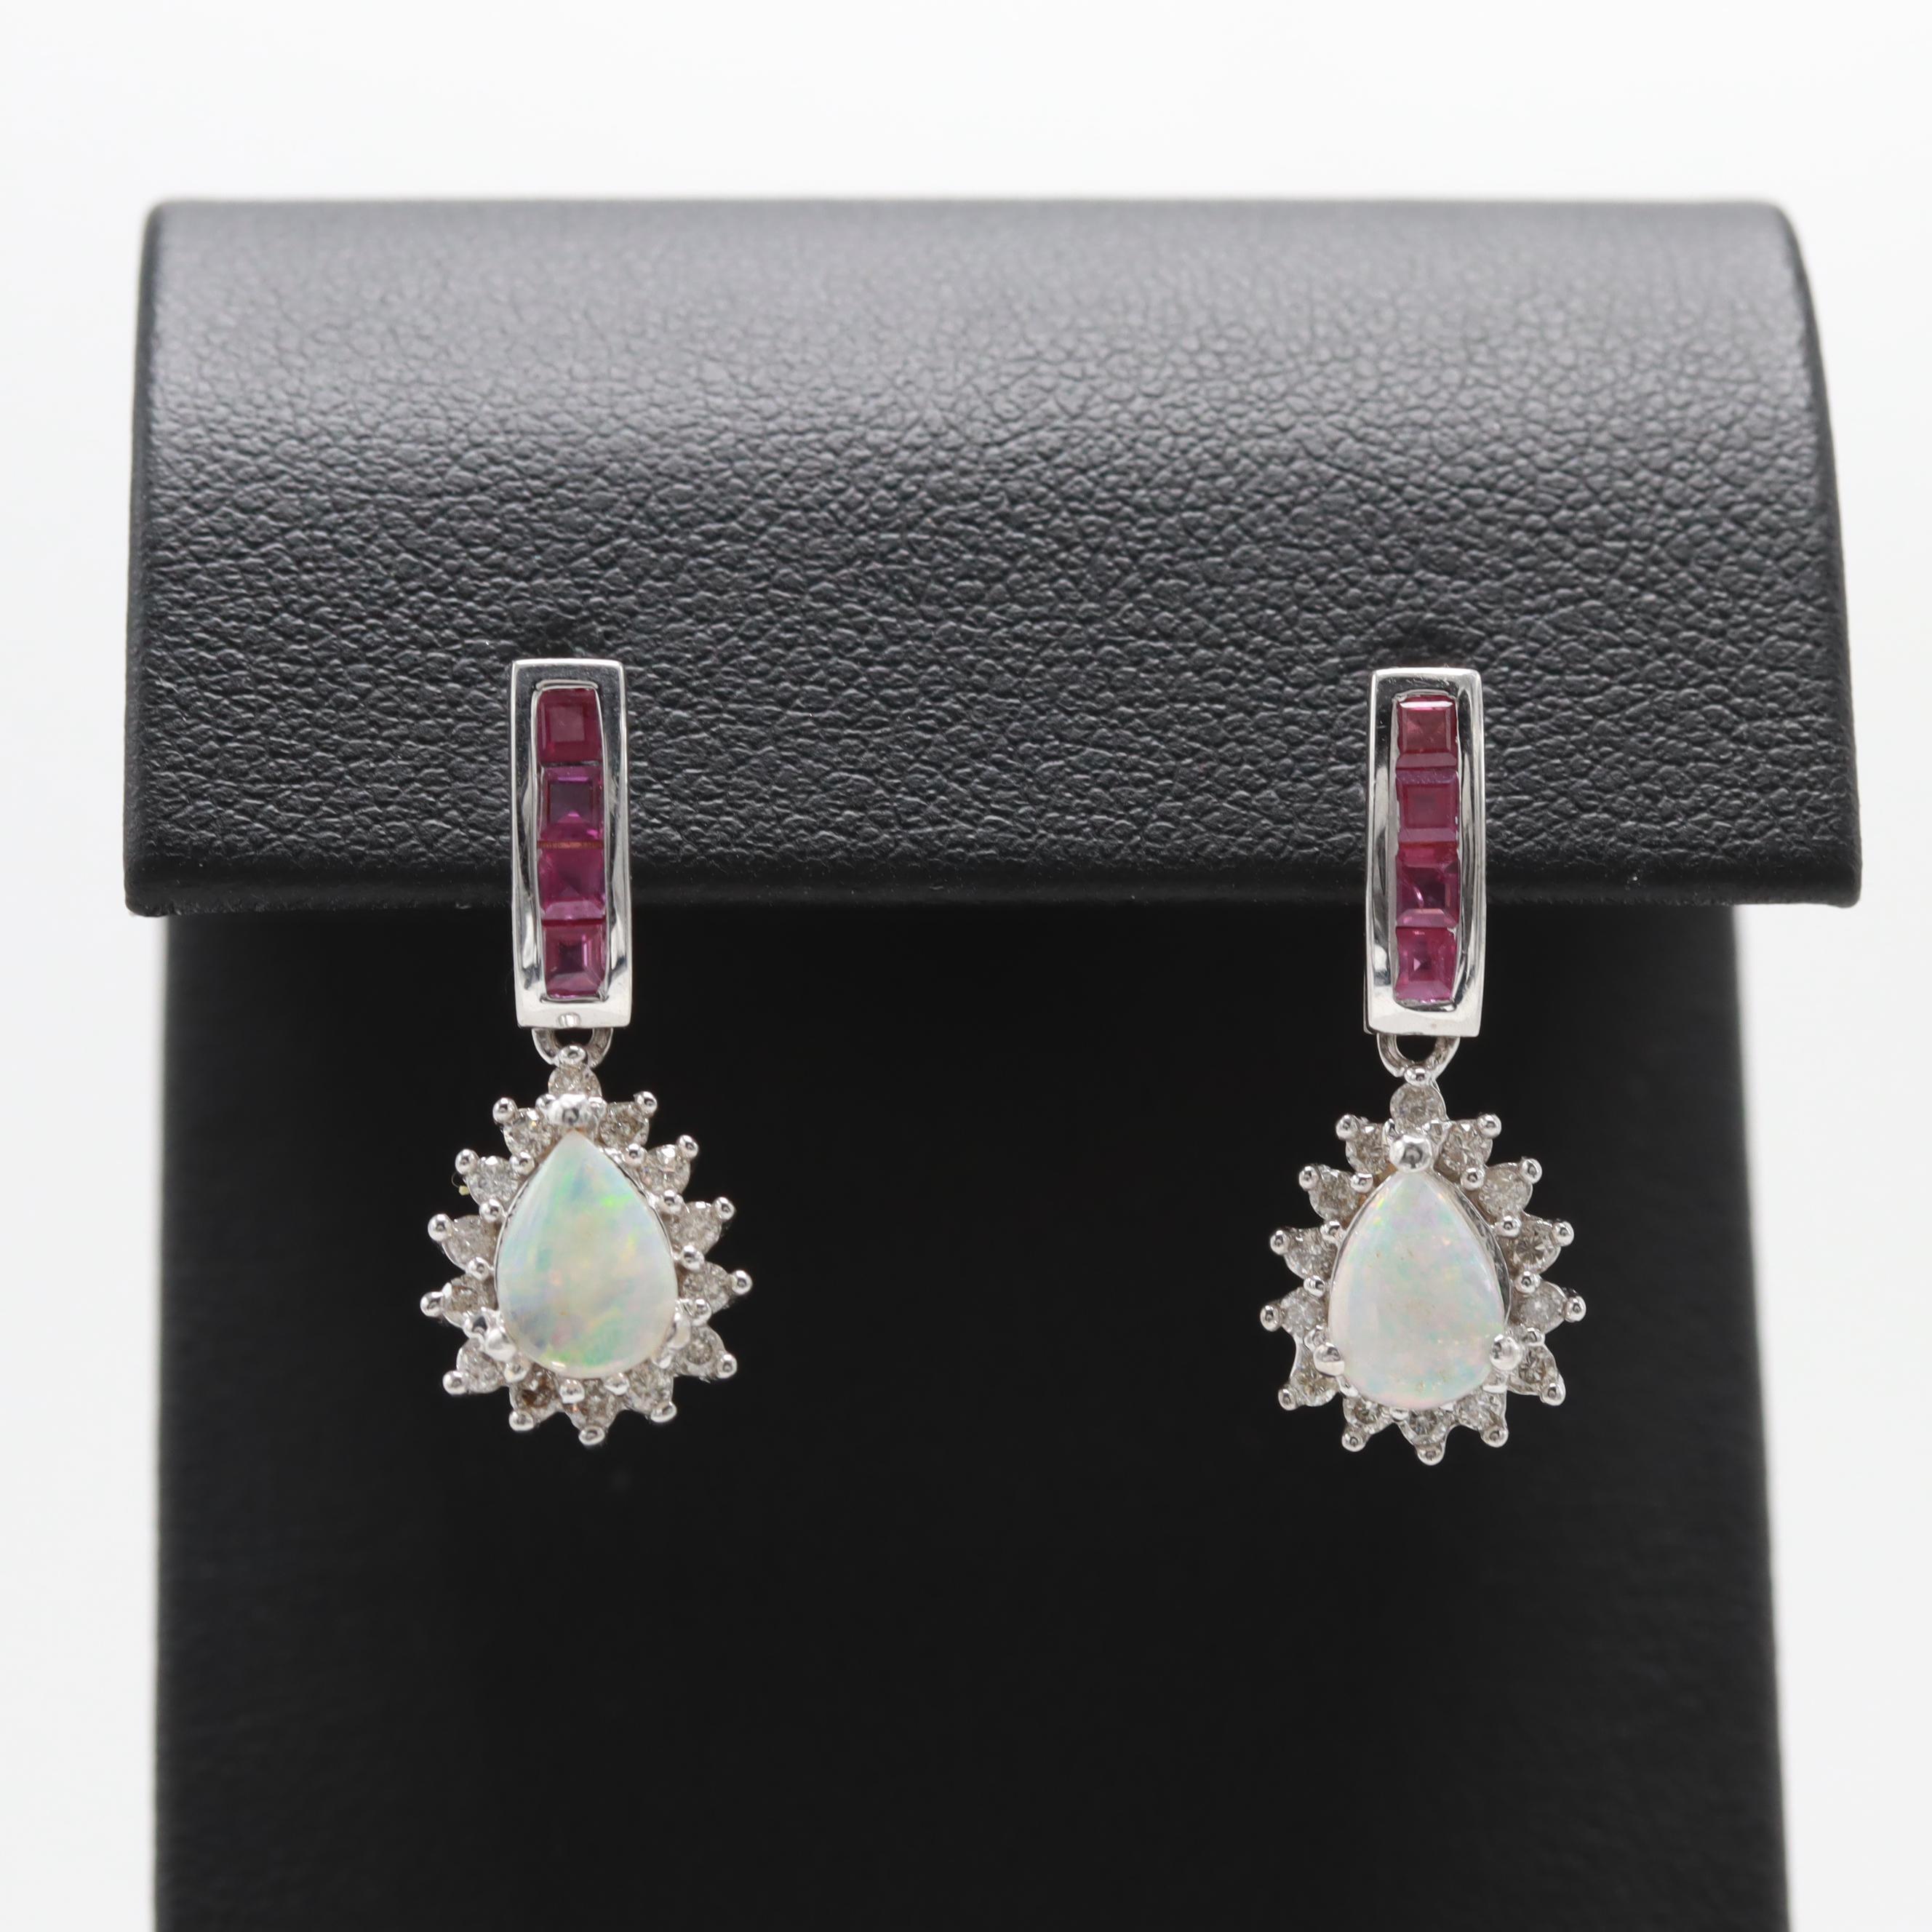 14K White Gold Opal, Diamond and Ruby Drop Earrings